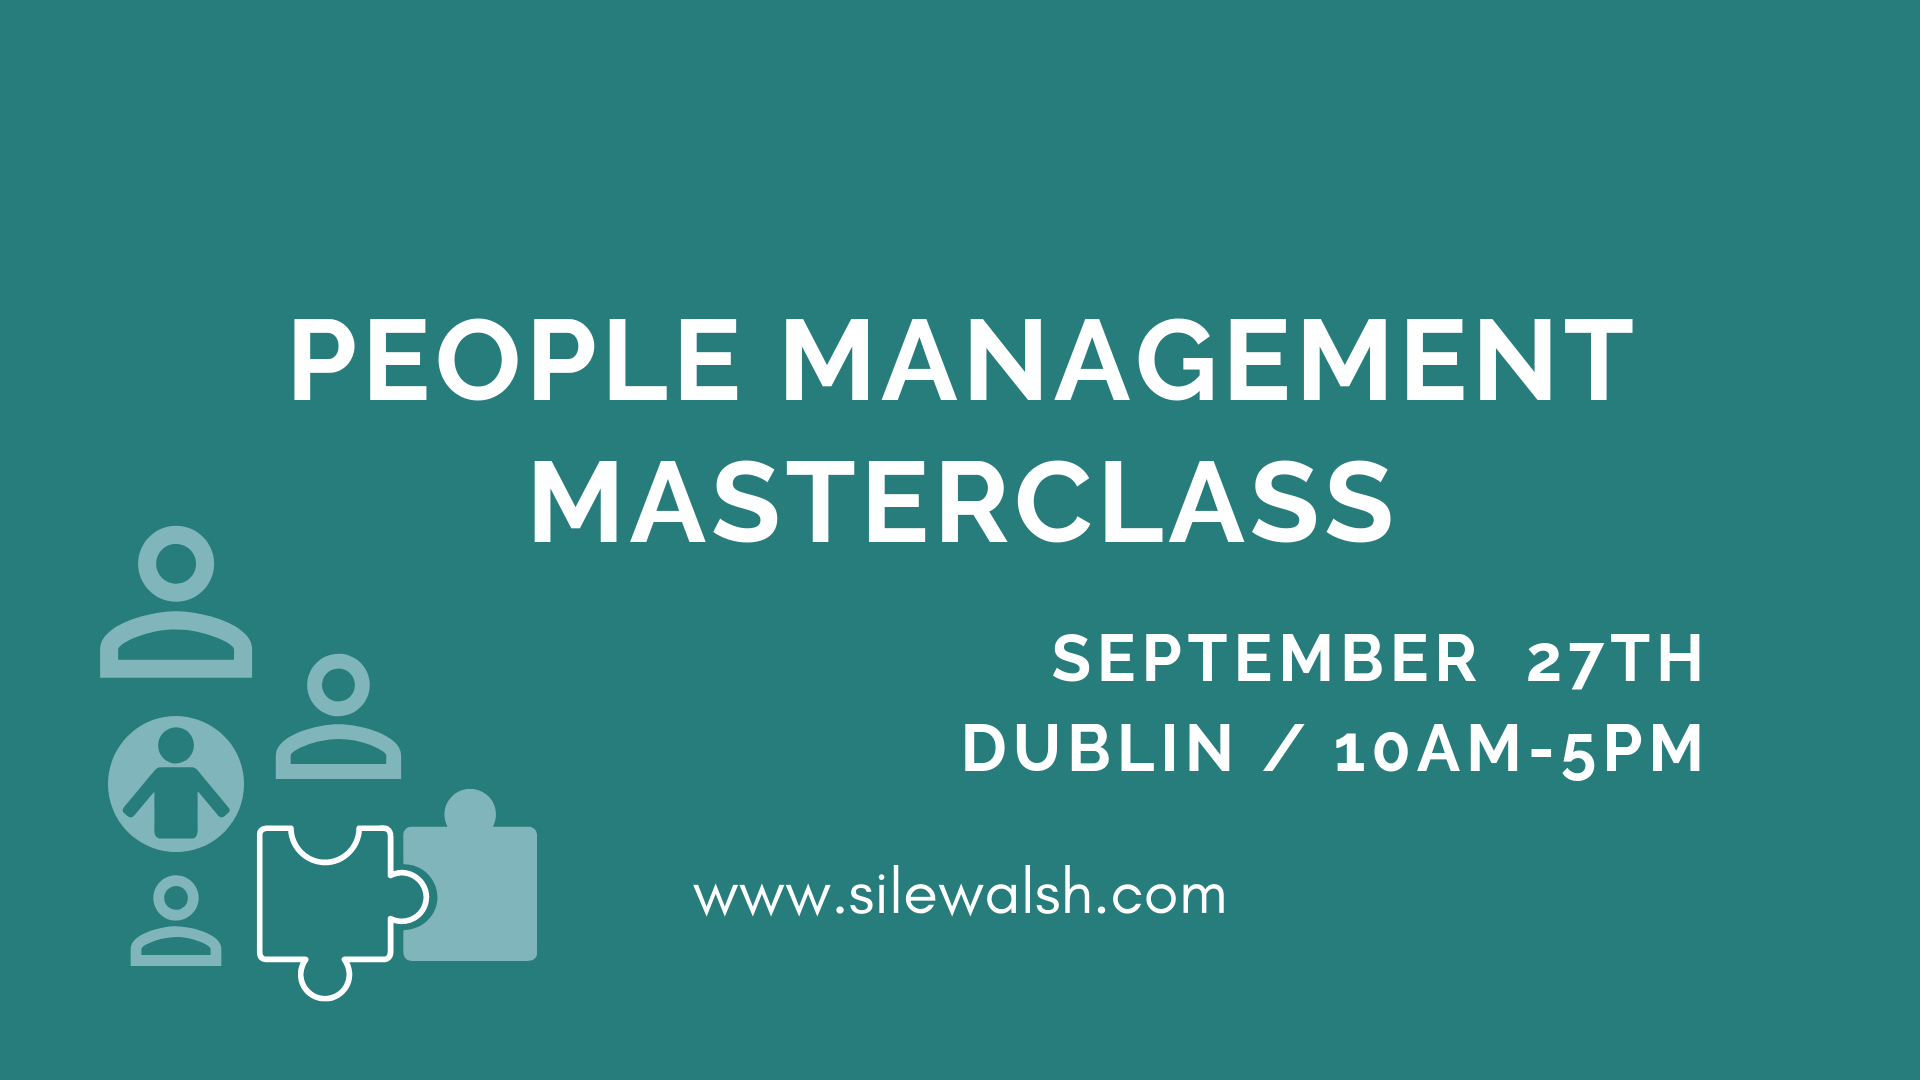 People Management Masterclass Dublin